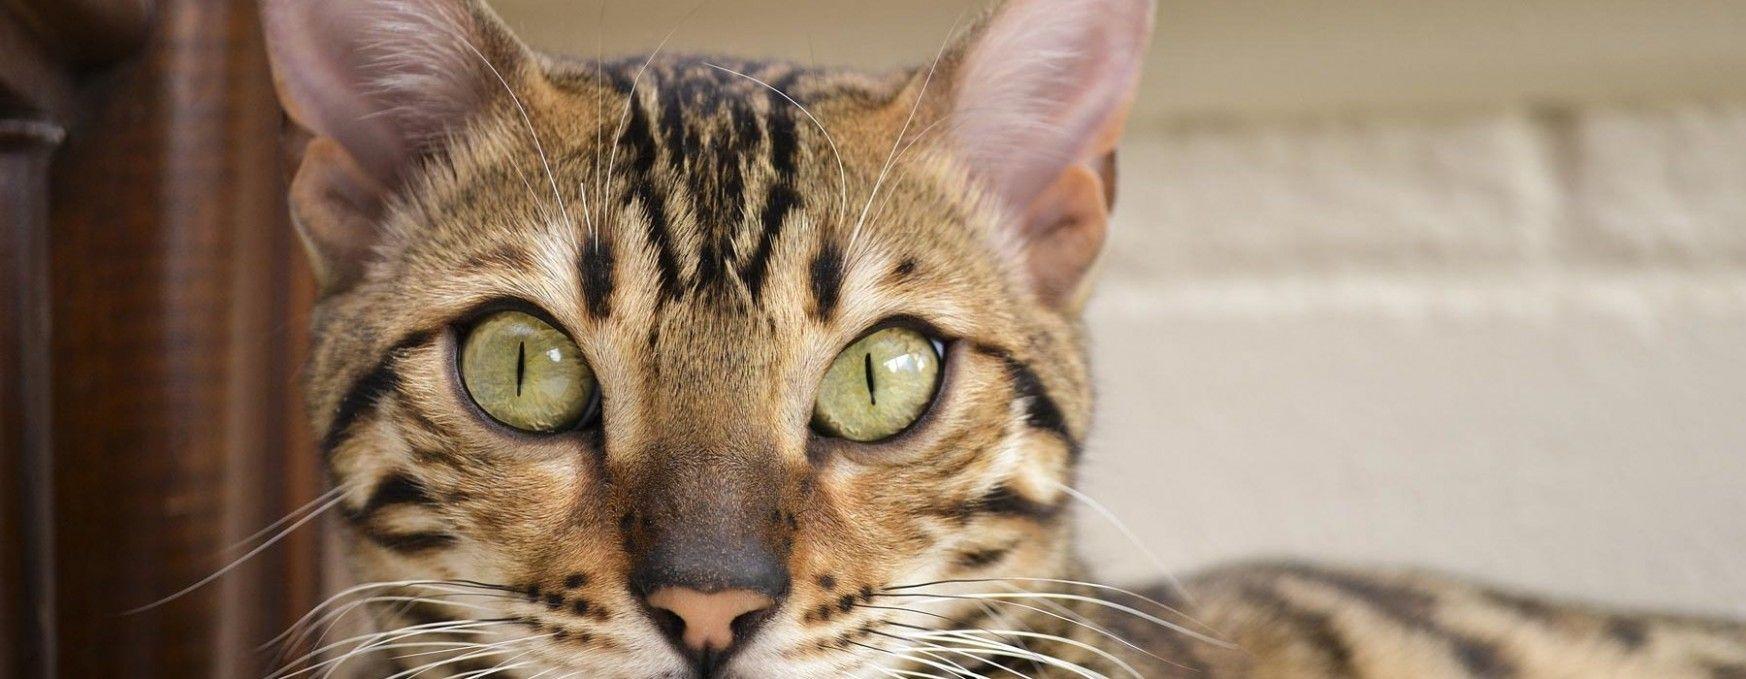 Siamese Kittens For Sale By Reputable Breeders Gatos Siameses Gato Siames Gatitos Lindos